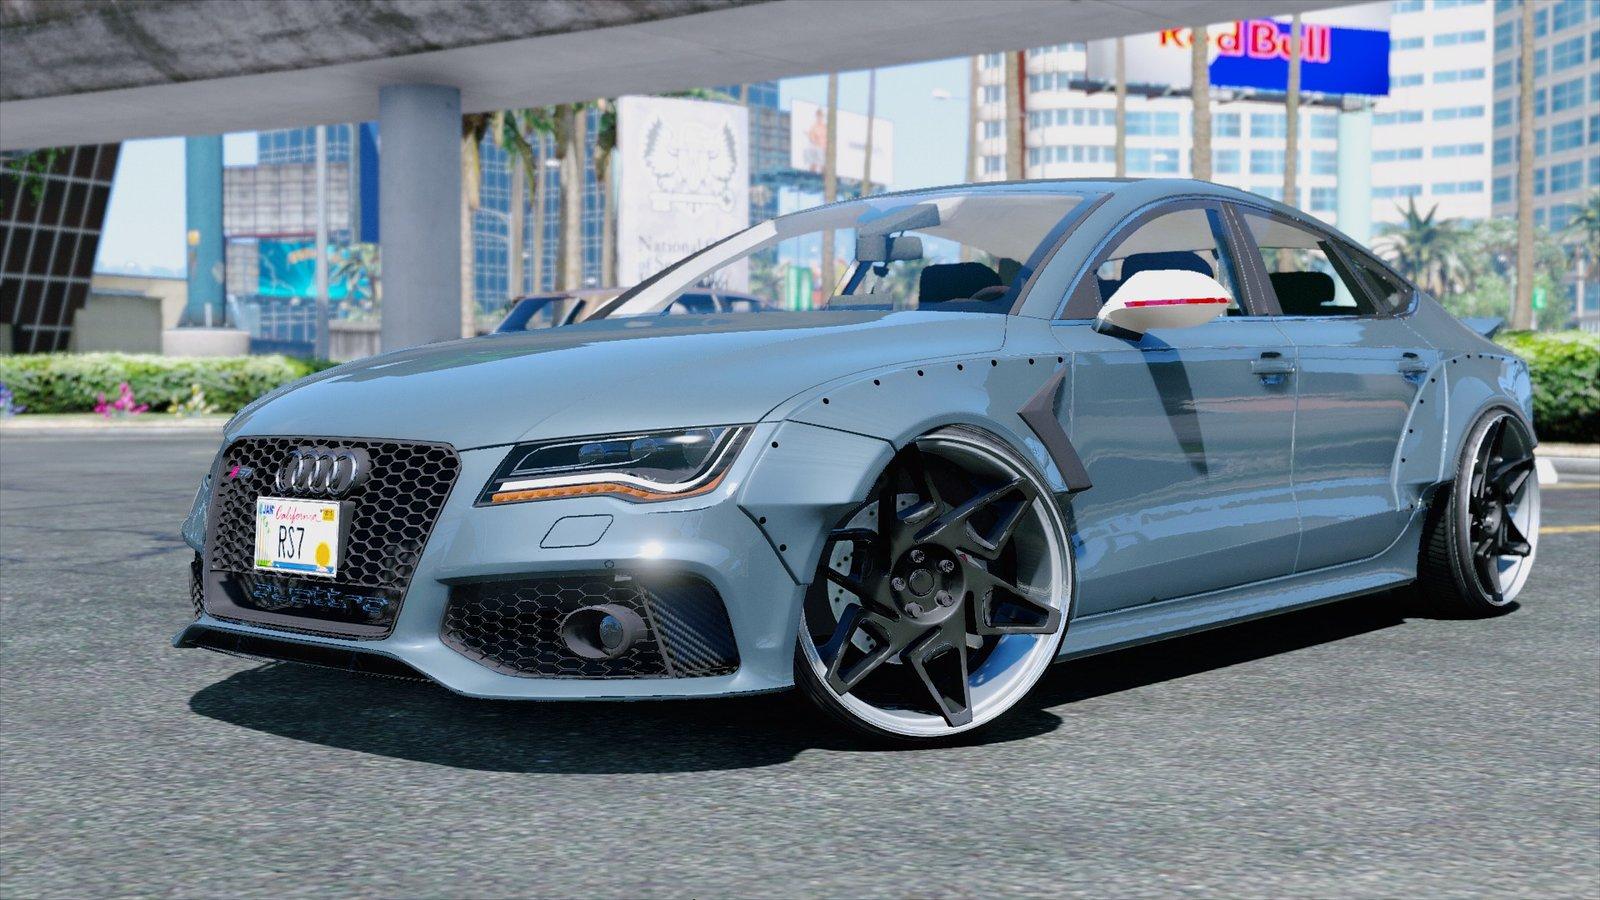 pagani zonda mod with 2668 Audi Rs7 X Uk on 22581 additionally 2668 Audi Rs7 X Uk besides Werewolf Woman besides Liberty Walk Bugatti Veyron Is Not Impossible 103530 also 24867 Monster Patriot.